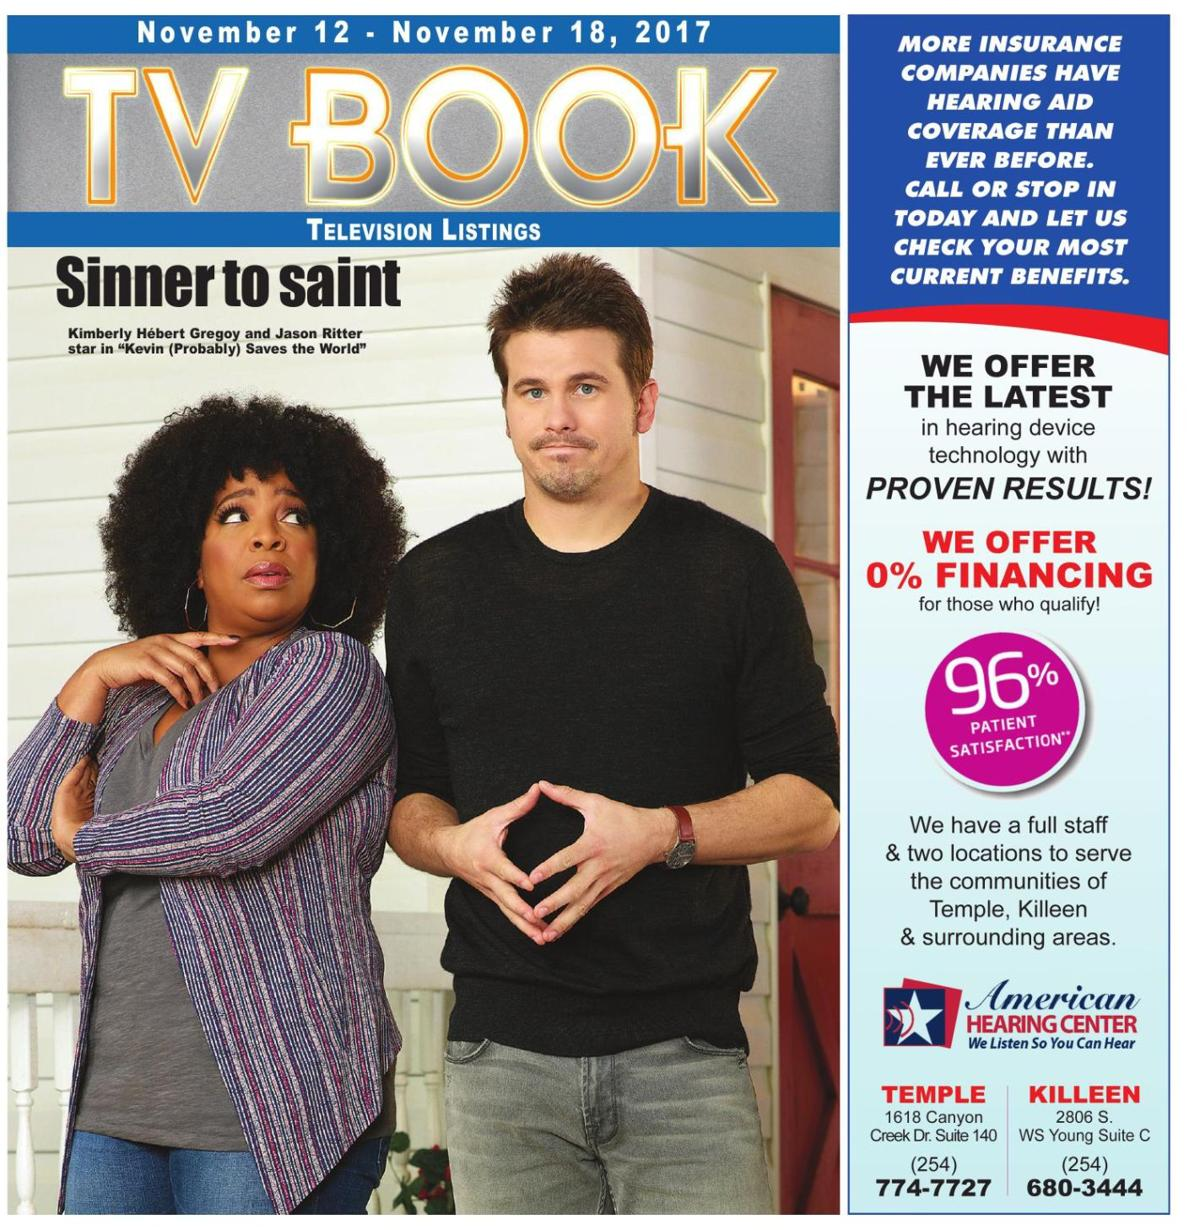 TV Book November 12th - 18th